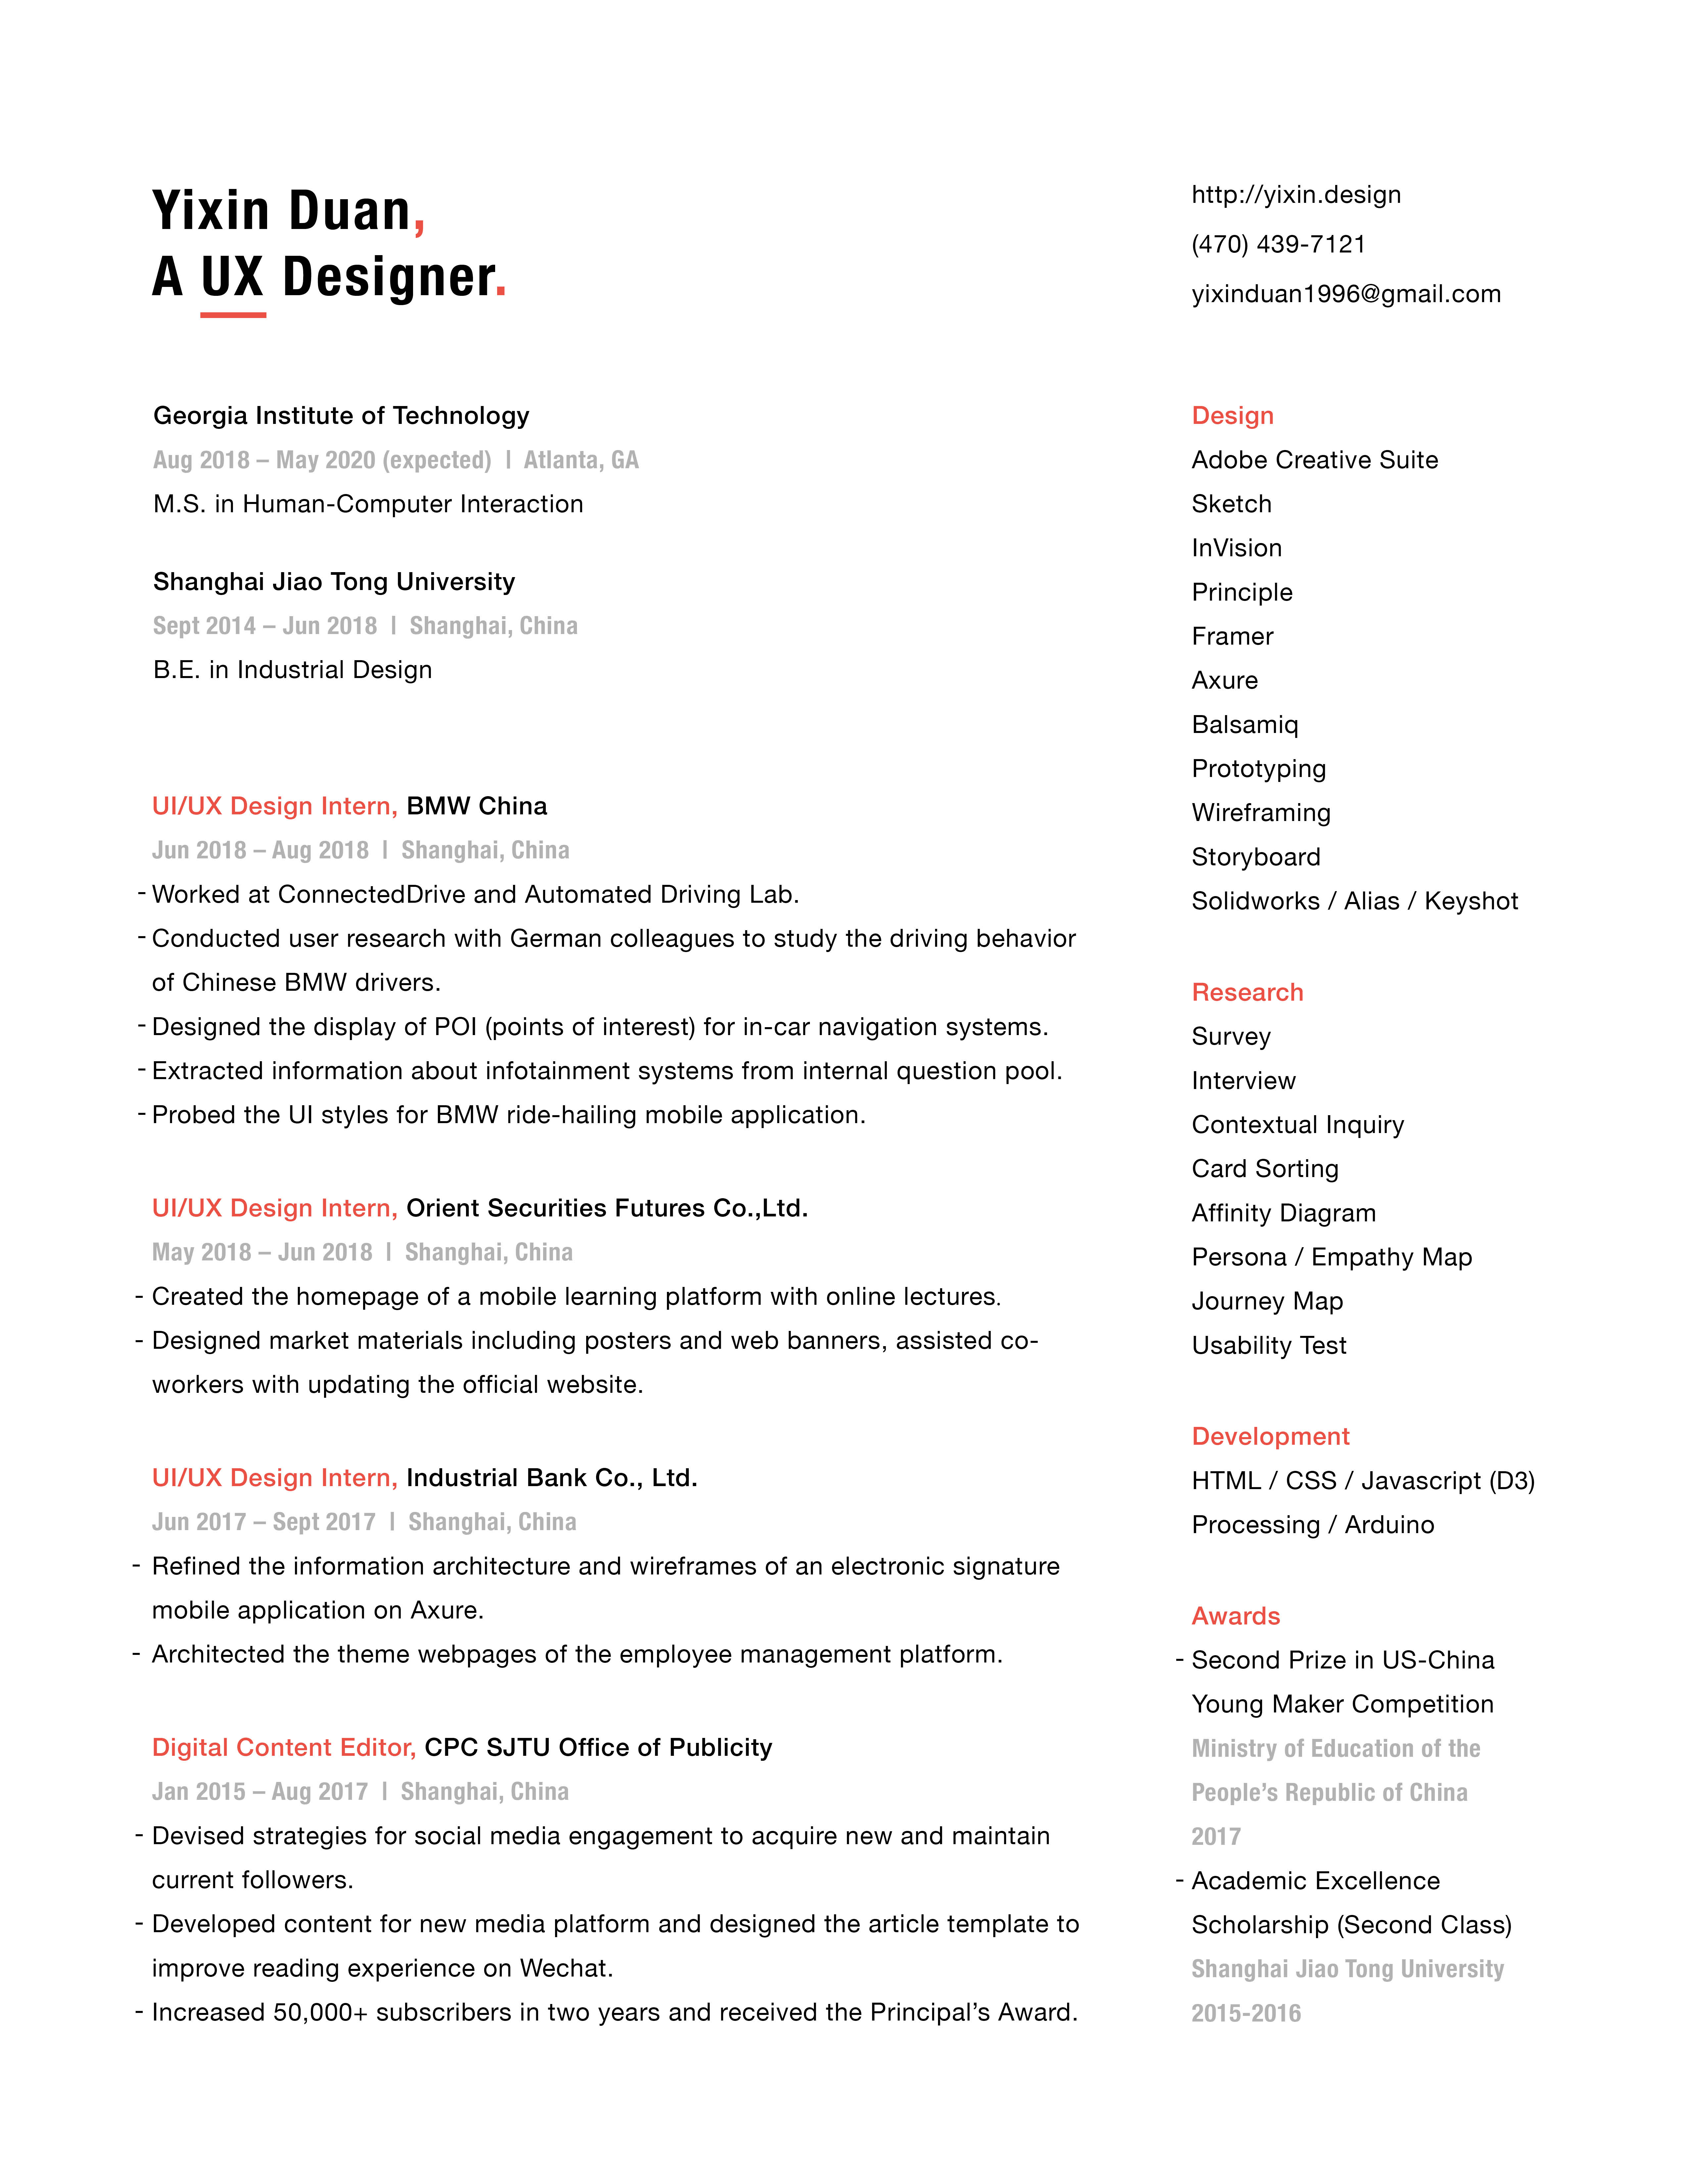 resume_0303